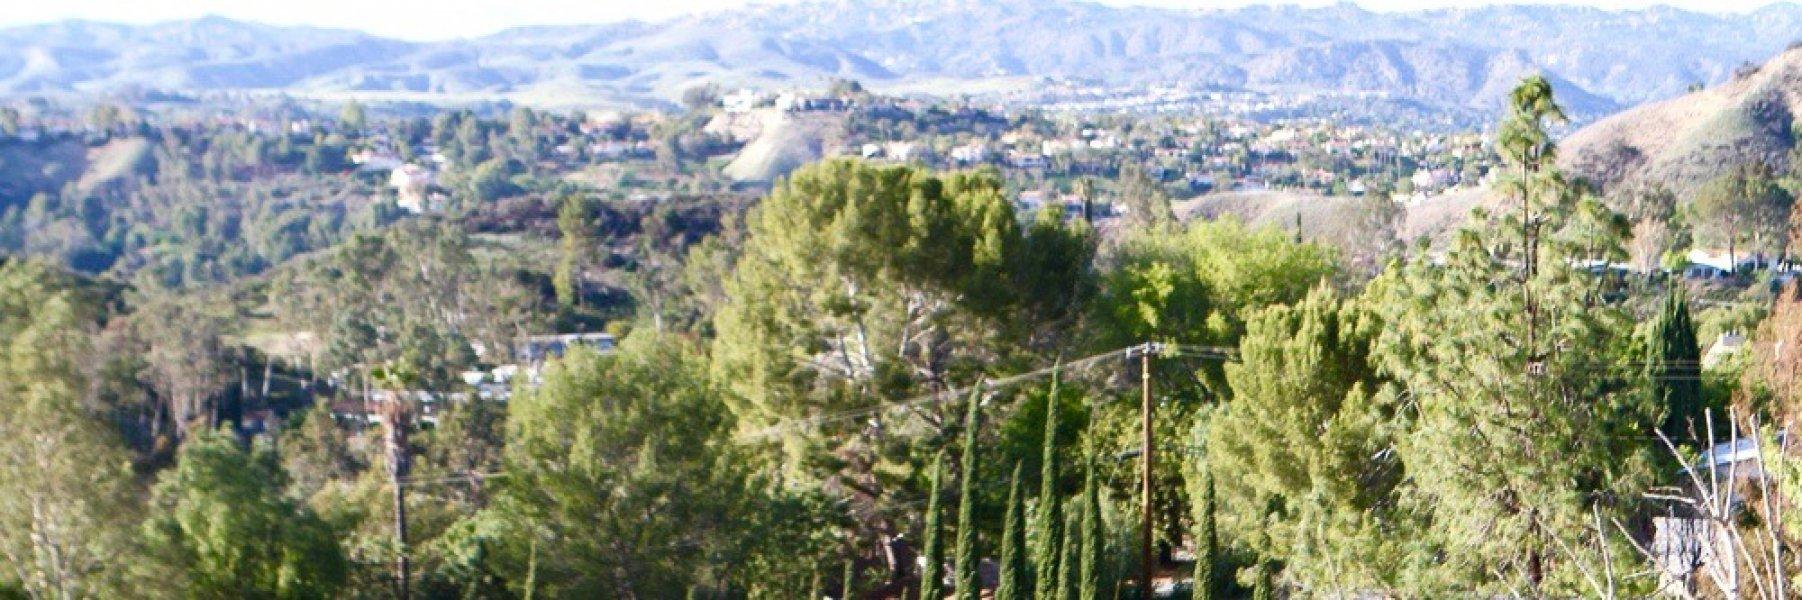 Calabasas Highlands is a community of homes in Calabasas California